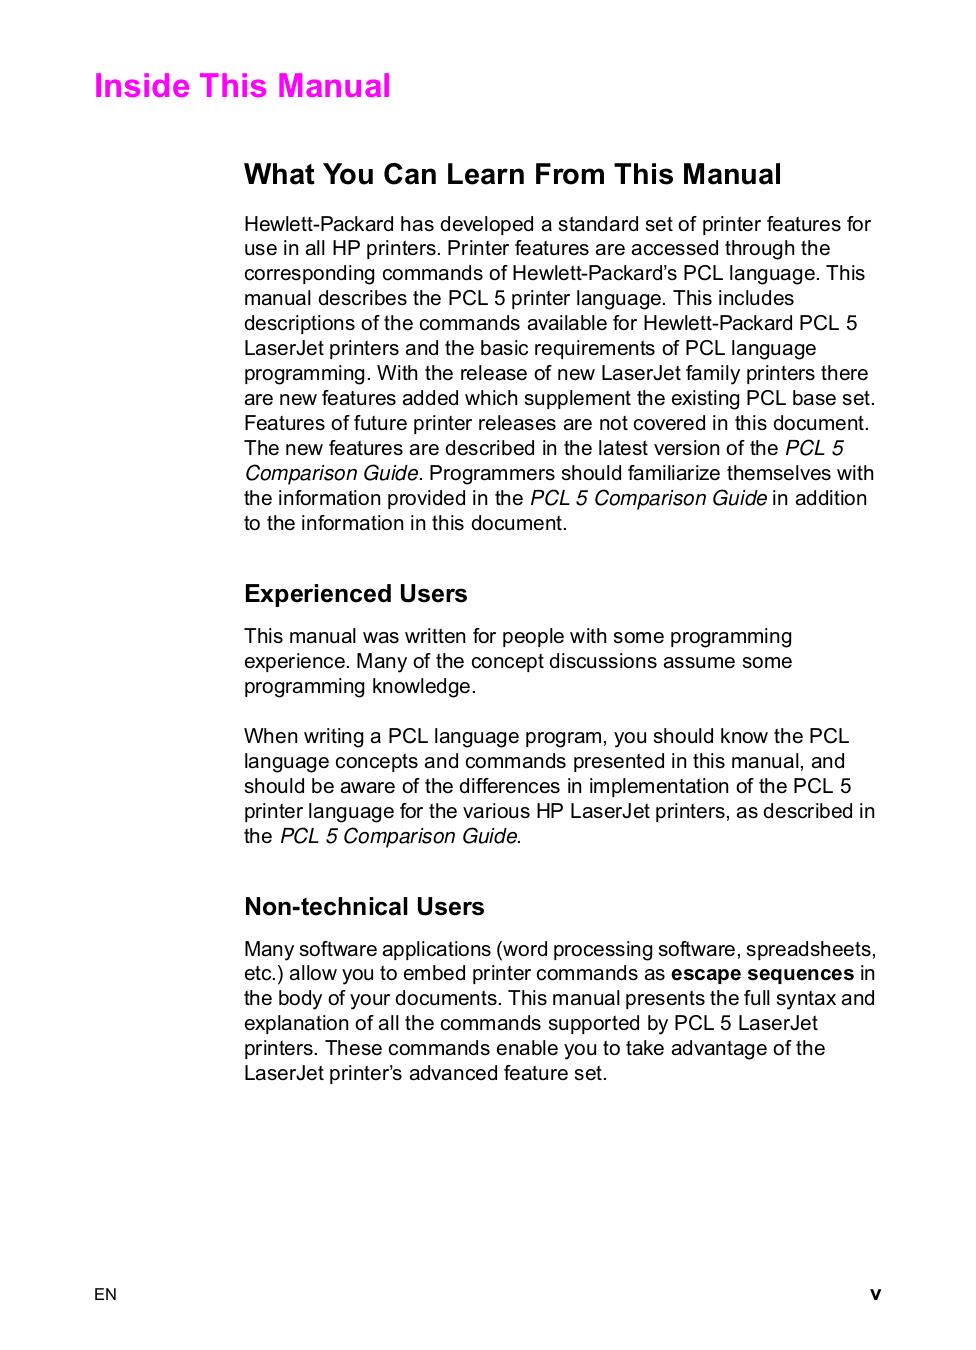 pcl reference manual rh pcl reference manual dohbots de MSC.Patran 2018 Patran Furry